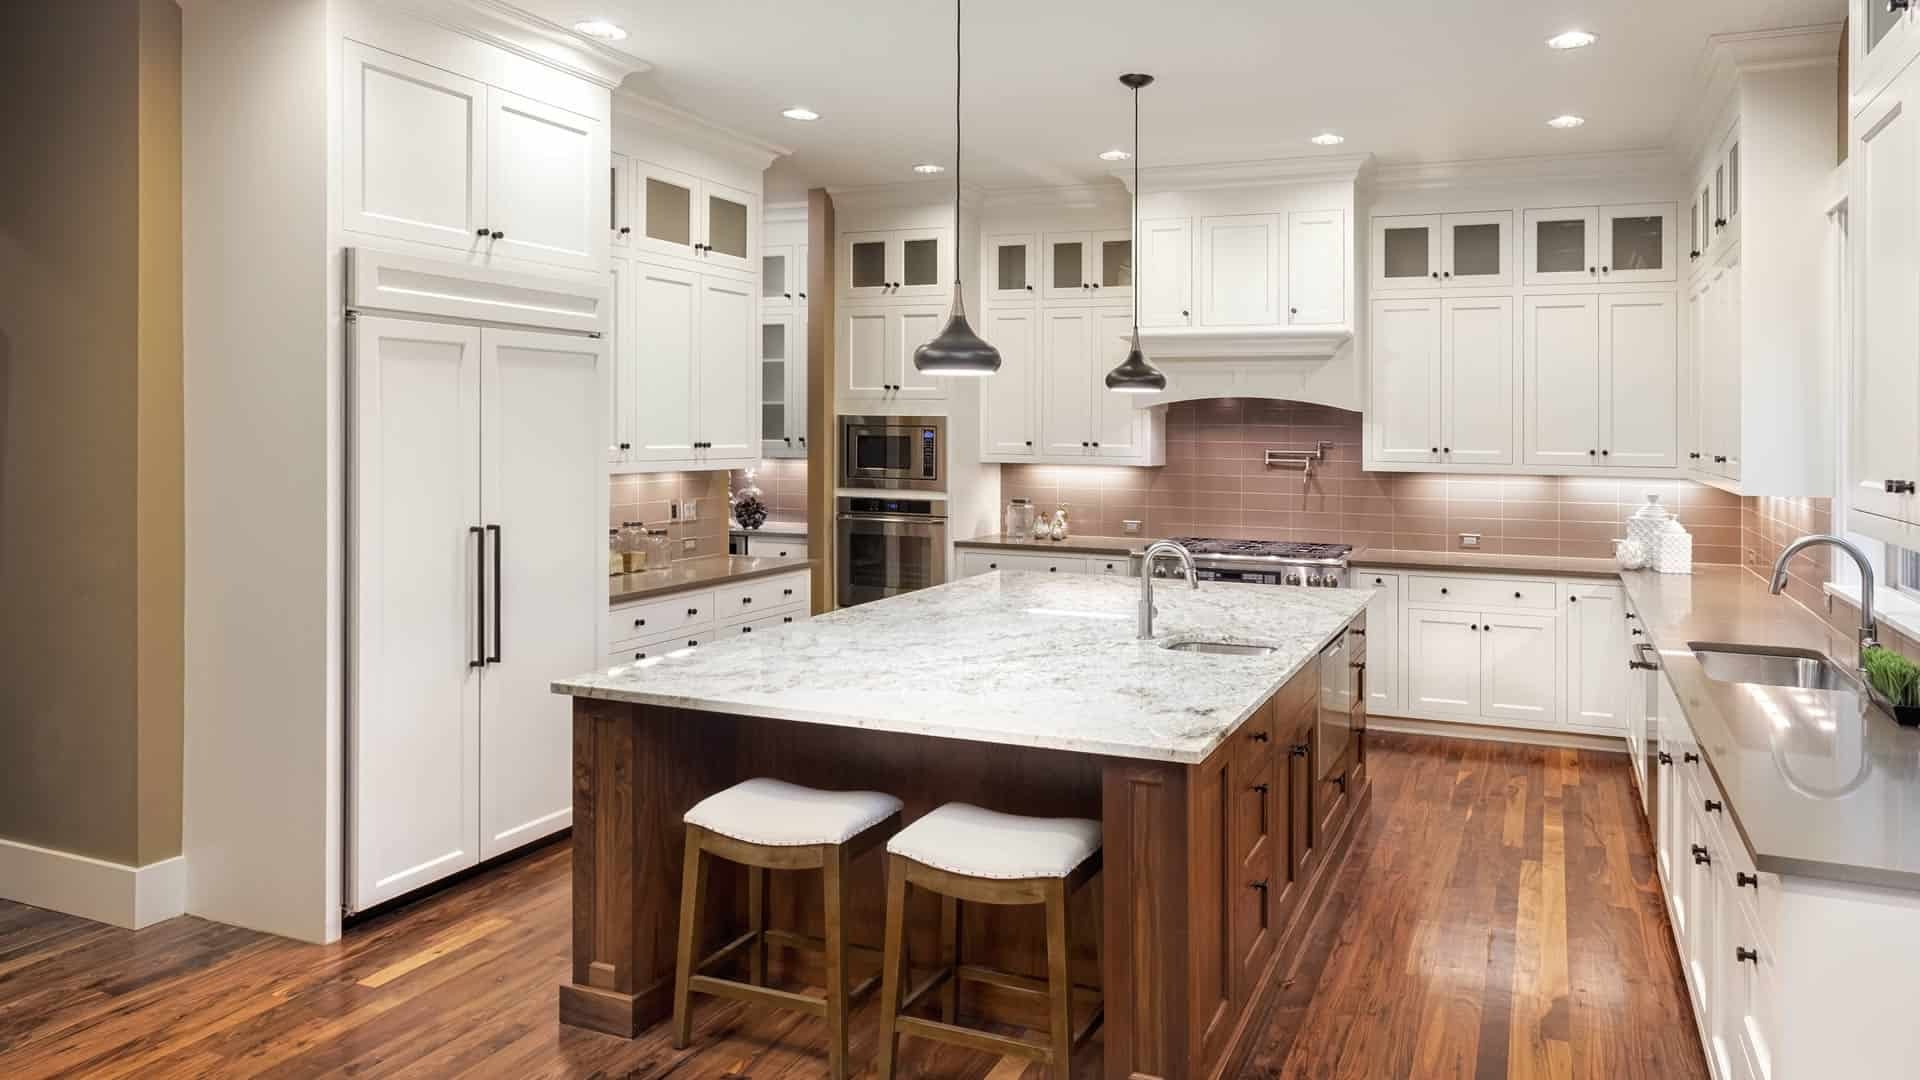 amazing kitchen bathroom remodeling photos austin tx. Black Bedroom Furniture Sets. Home Design Ideas